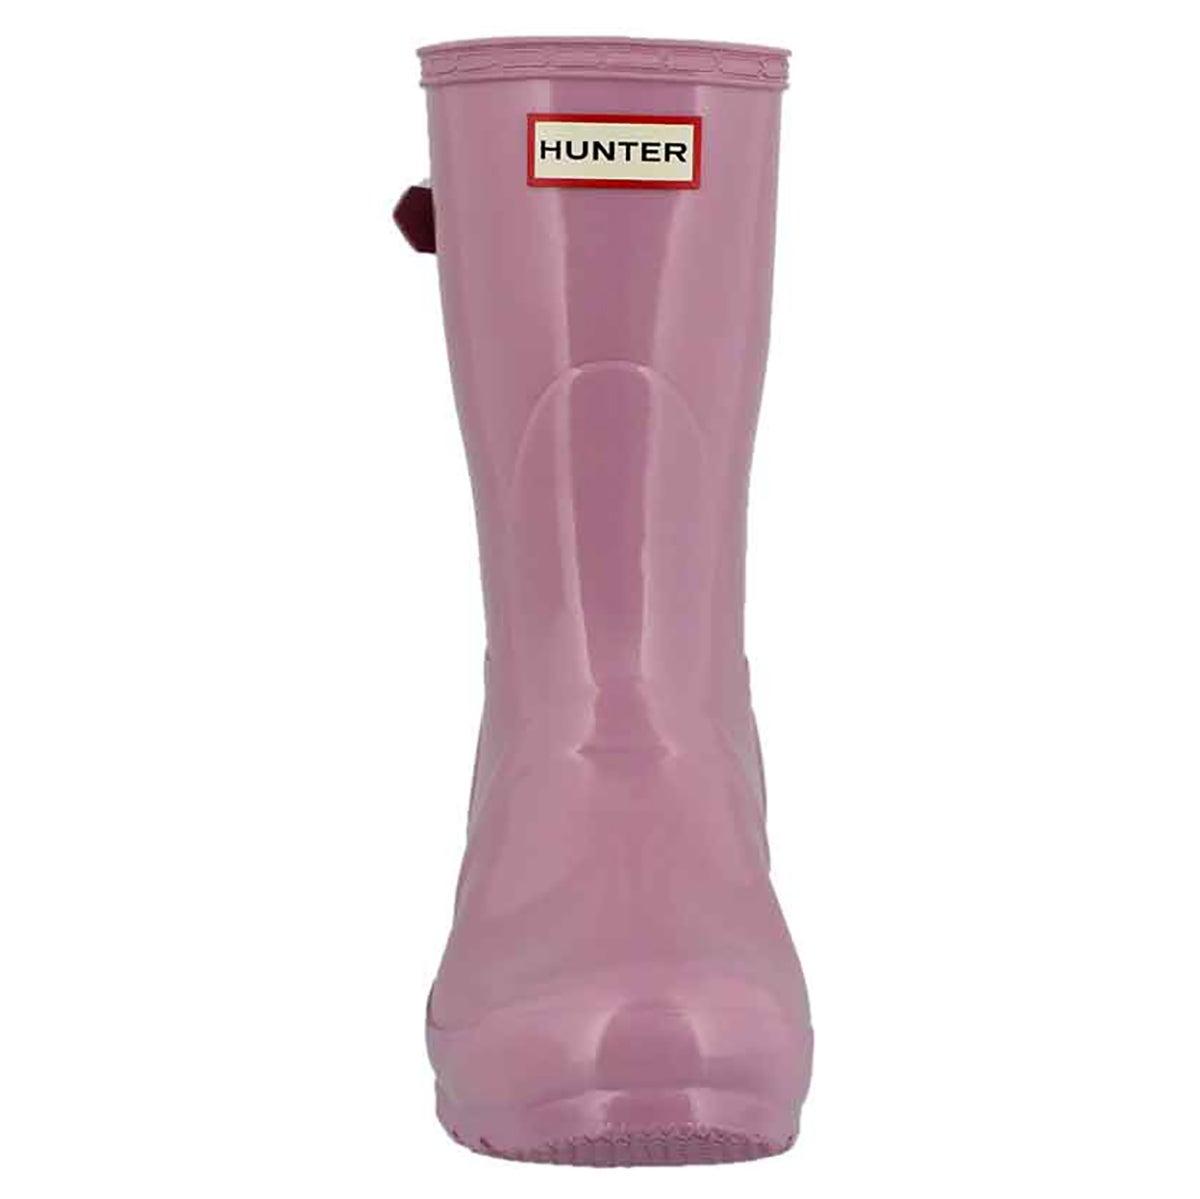 Hunter-Boots-Women-039-s-Original-Back-Adjustable-Short-Rain-Boot